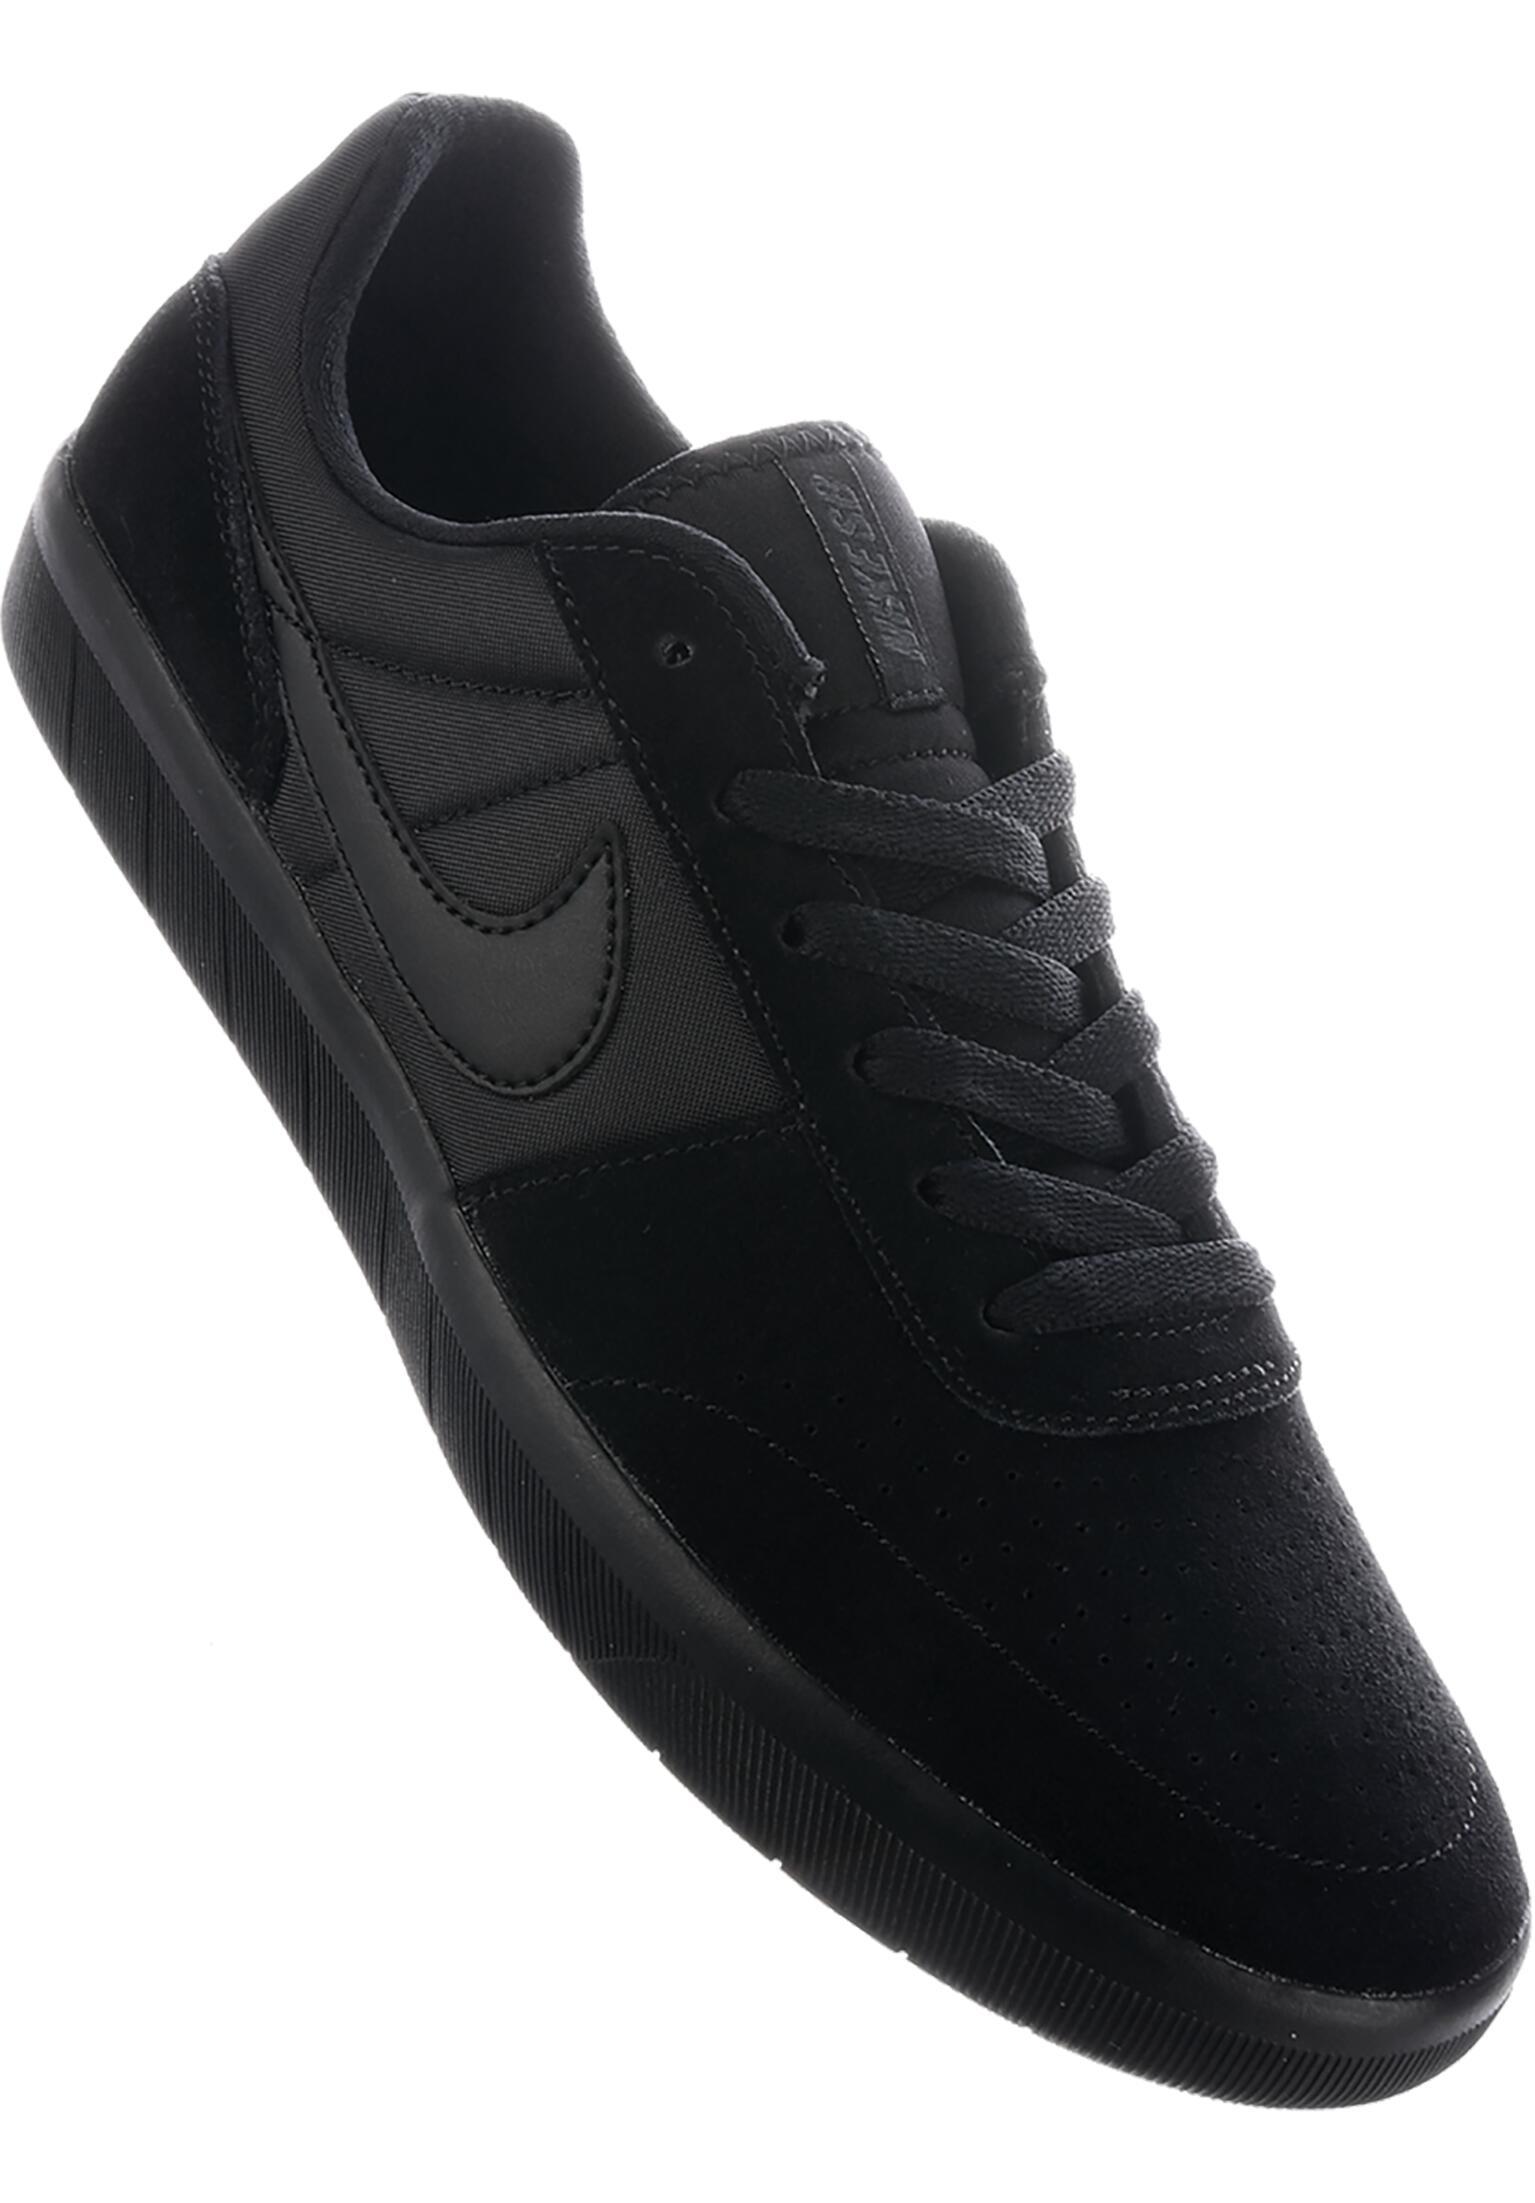 f82eeb8071 Team Classic Nike SB Alle Schuhe in black-black-anthracite für Herren    Titus